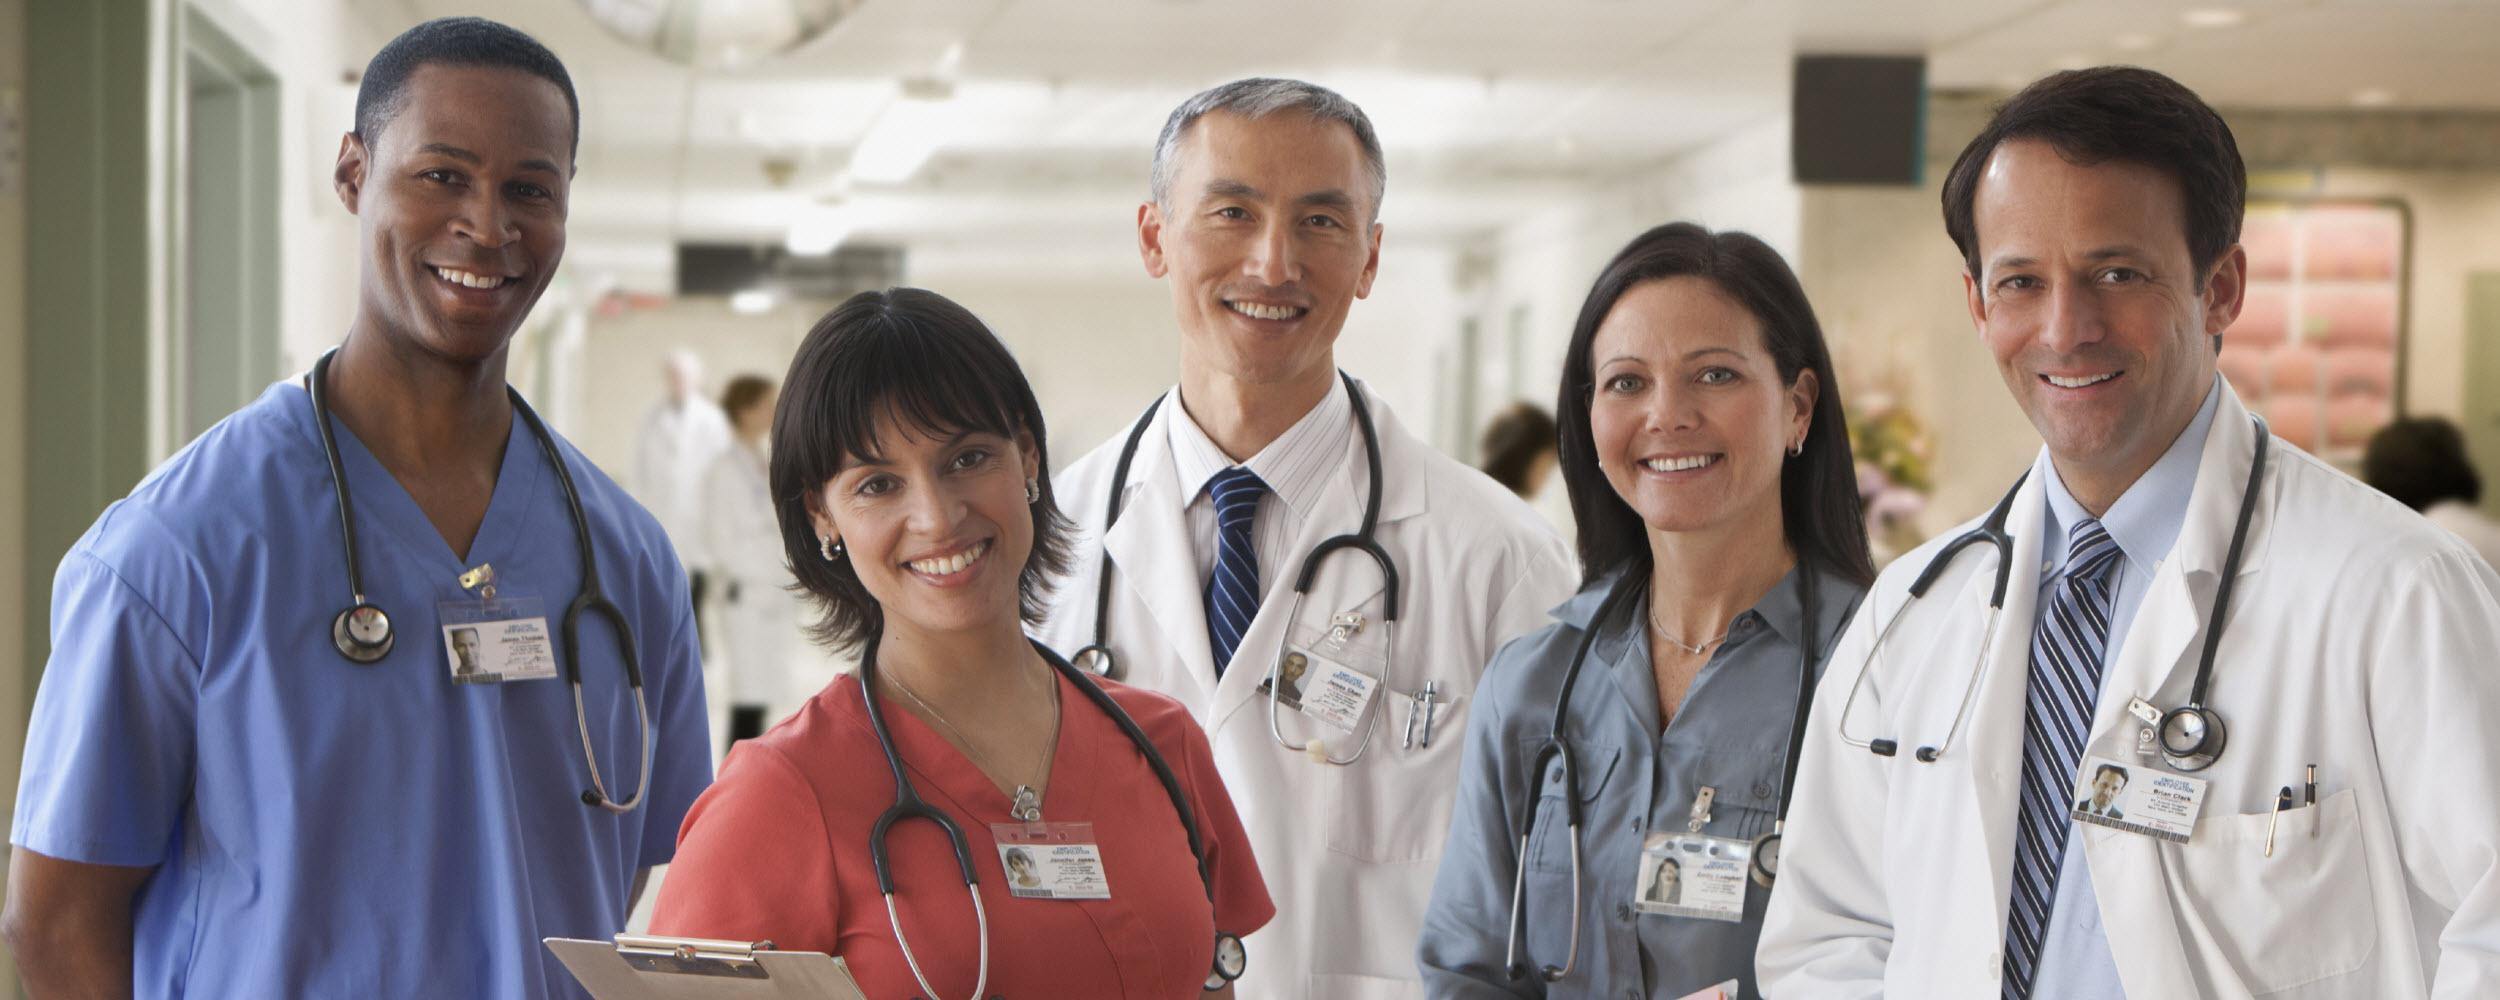 U S  News & World Report announces 2016-17 Best Hospitals rankings   RTI